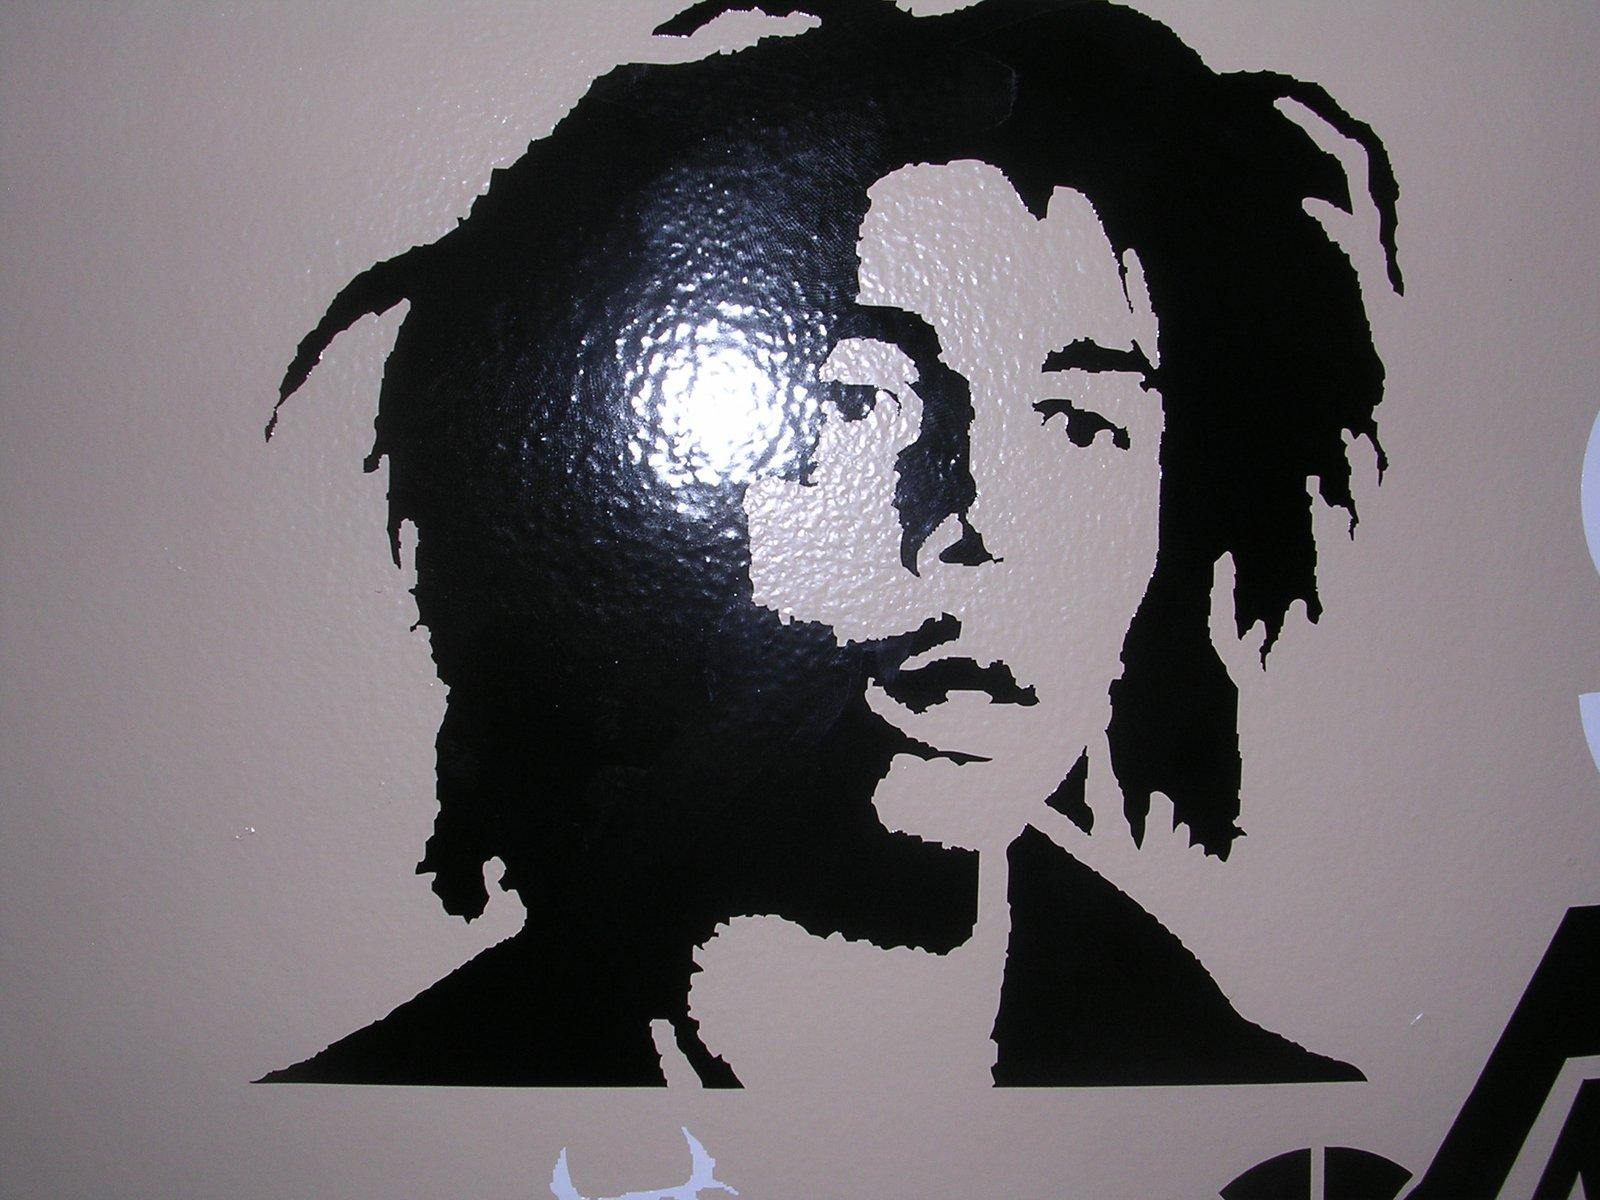 Bob marley sticker i have made